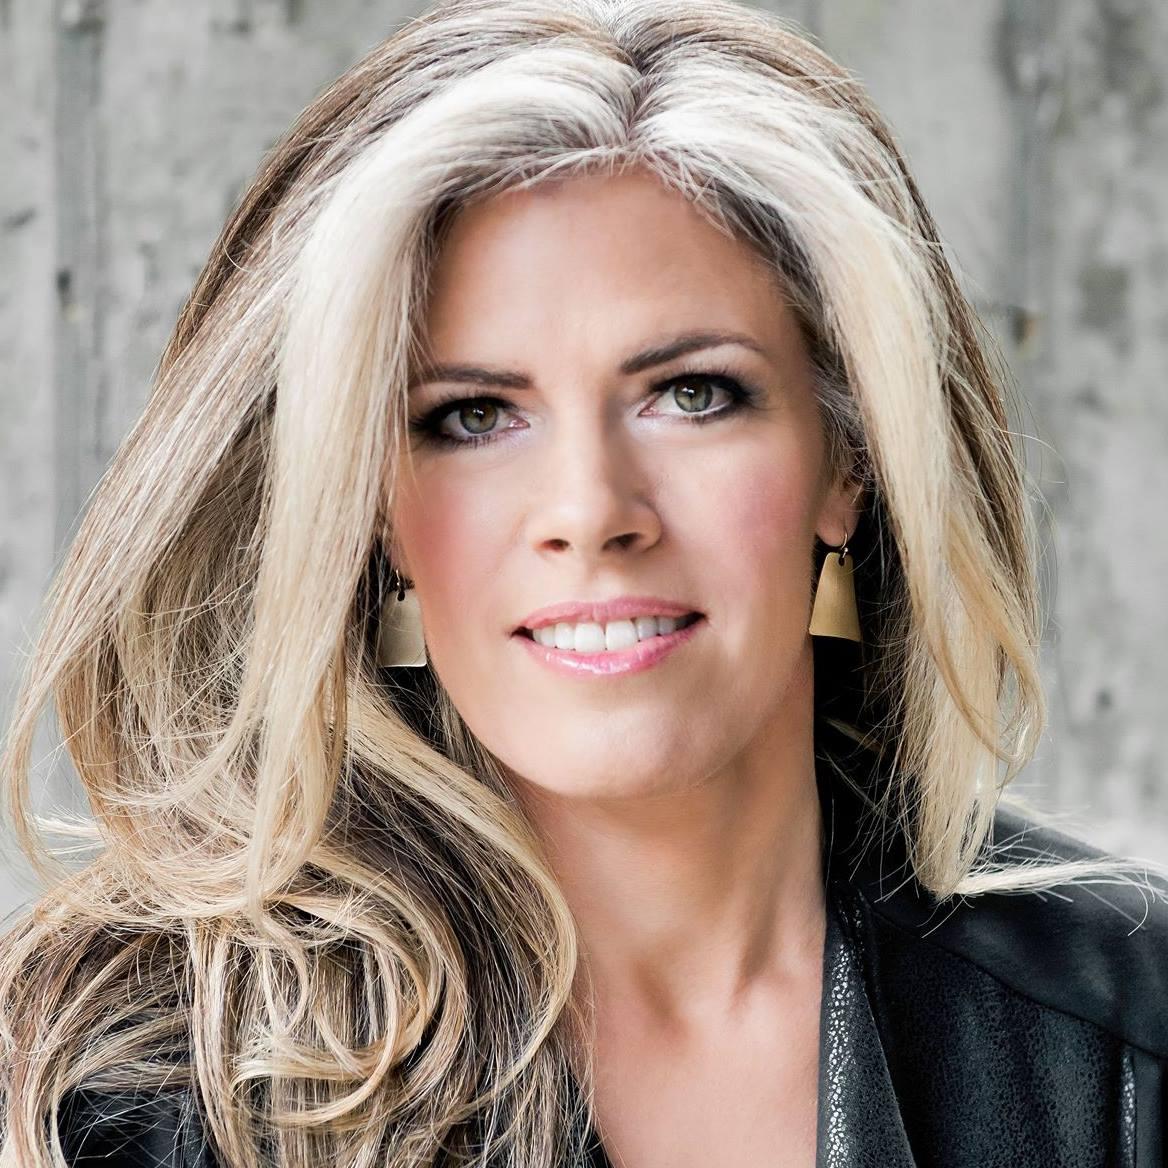 Adrienne Osborn, Founder and Lead Instructor